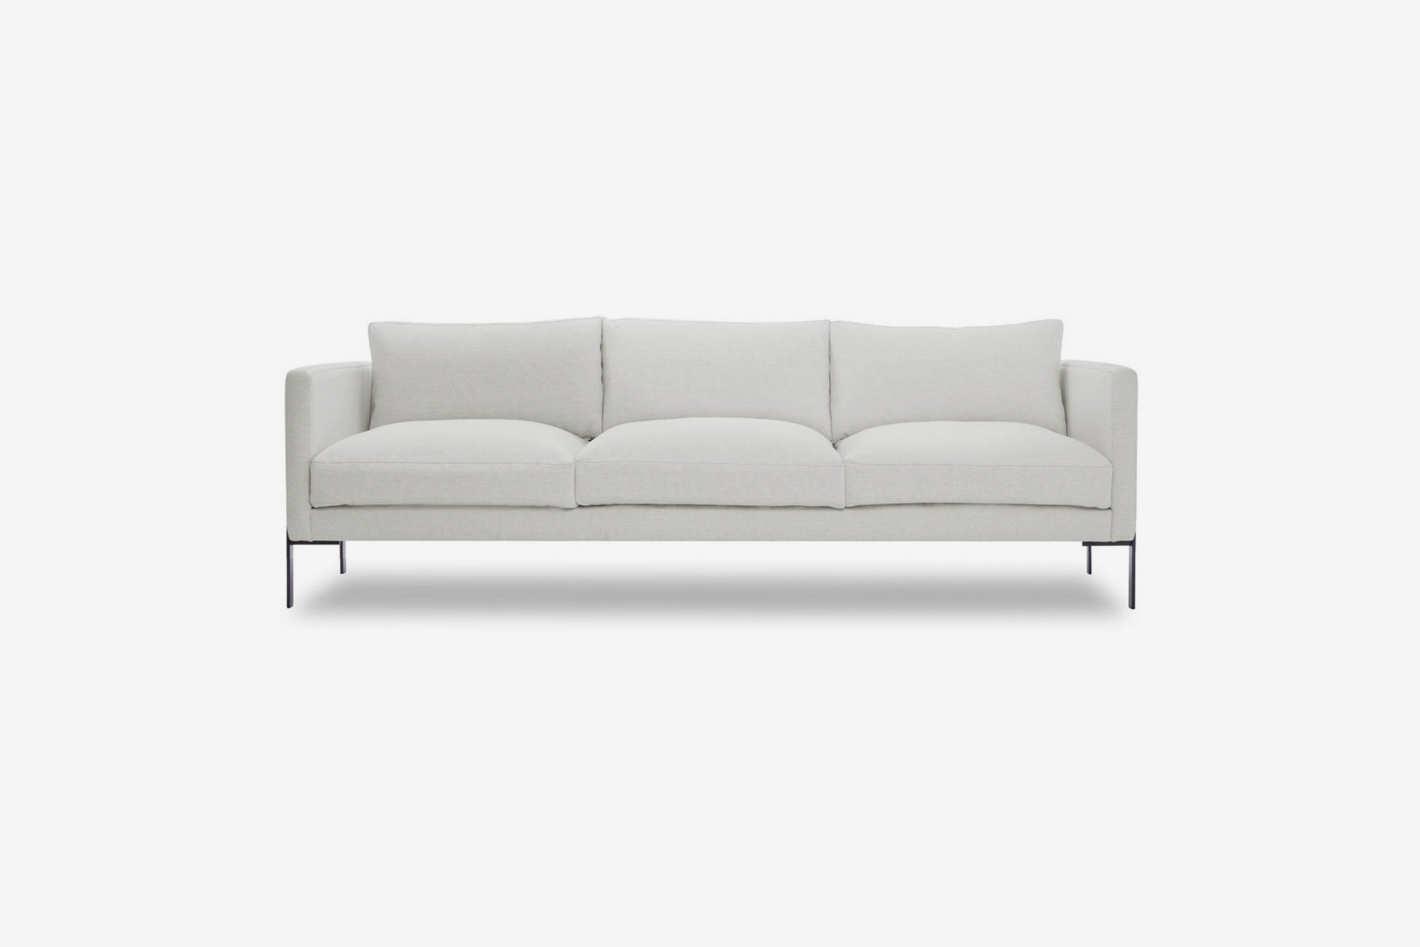 TRNK Truss Sofa